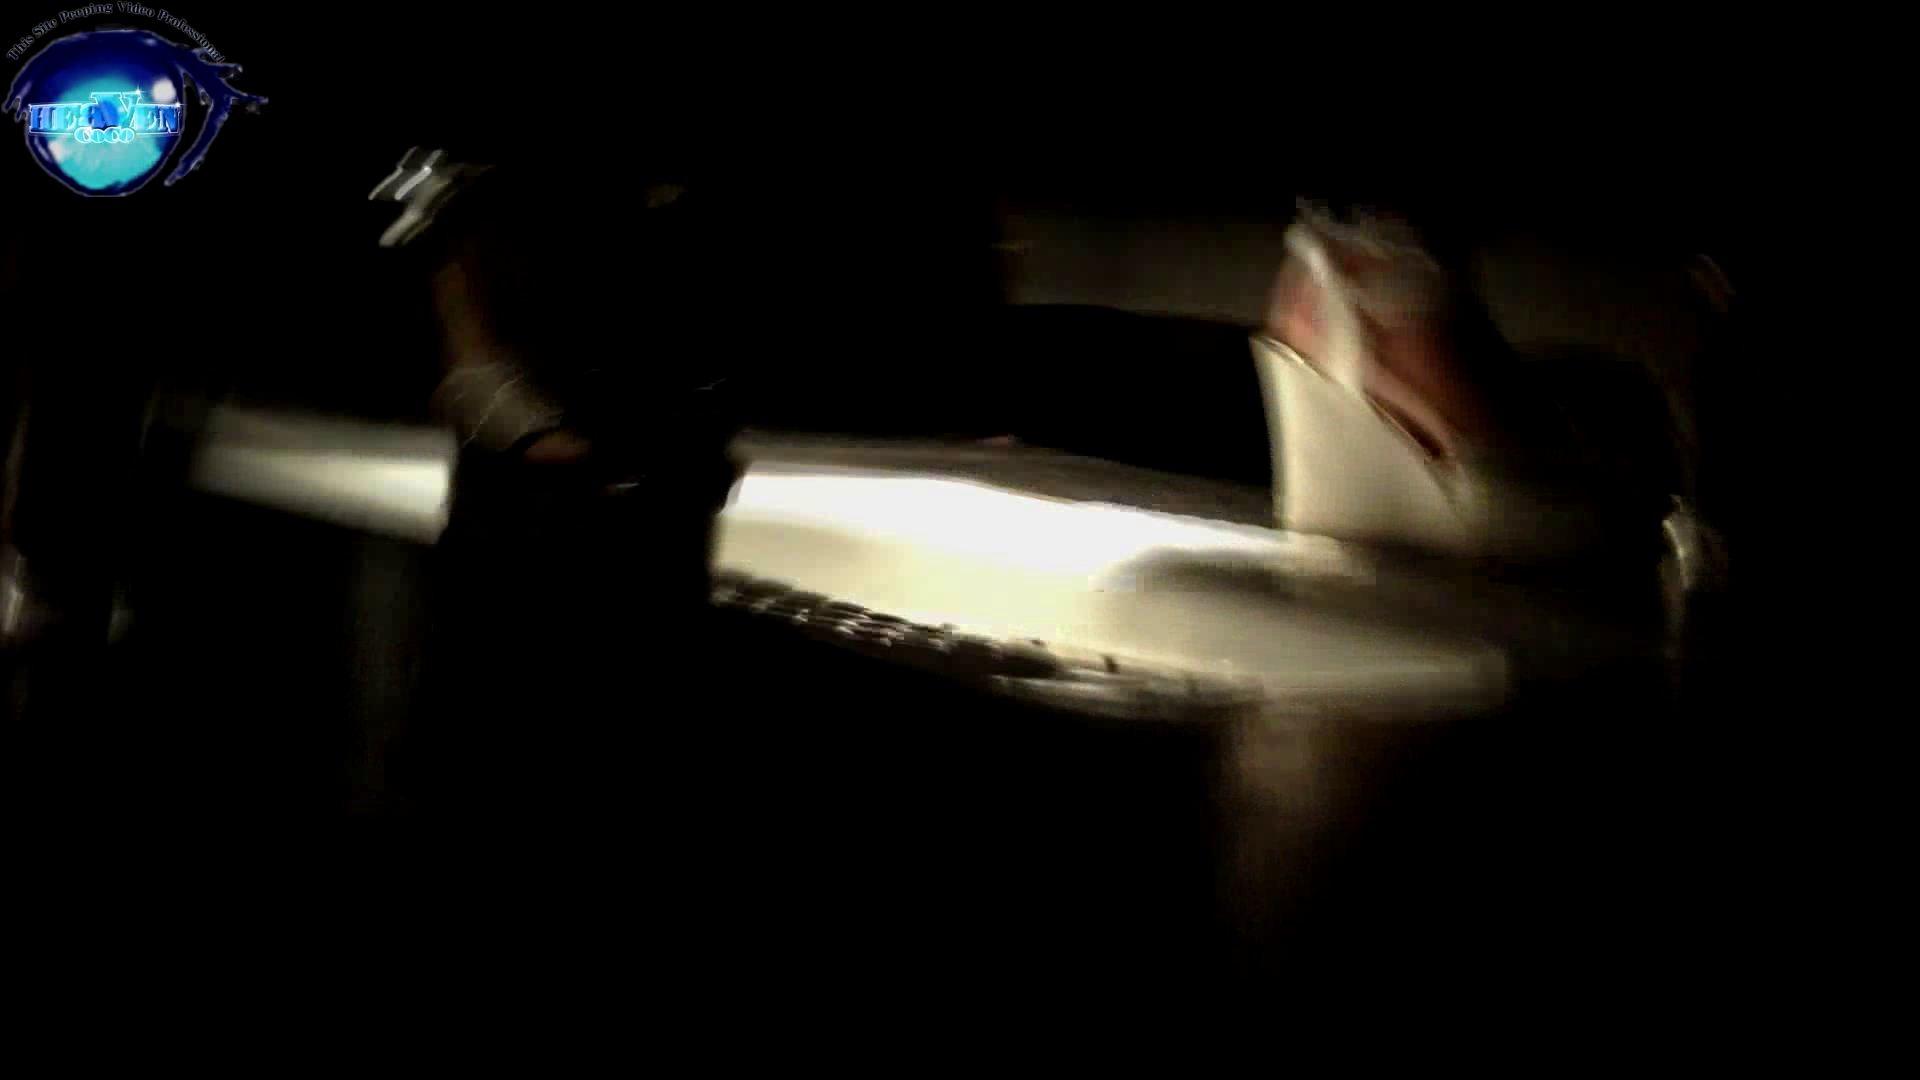 GOD HAND ファッションショッピングセンター盗撮vol.02後編 エロいOL AV無料 106枚